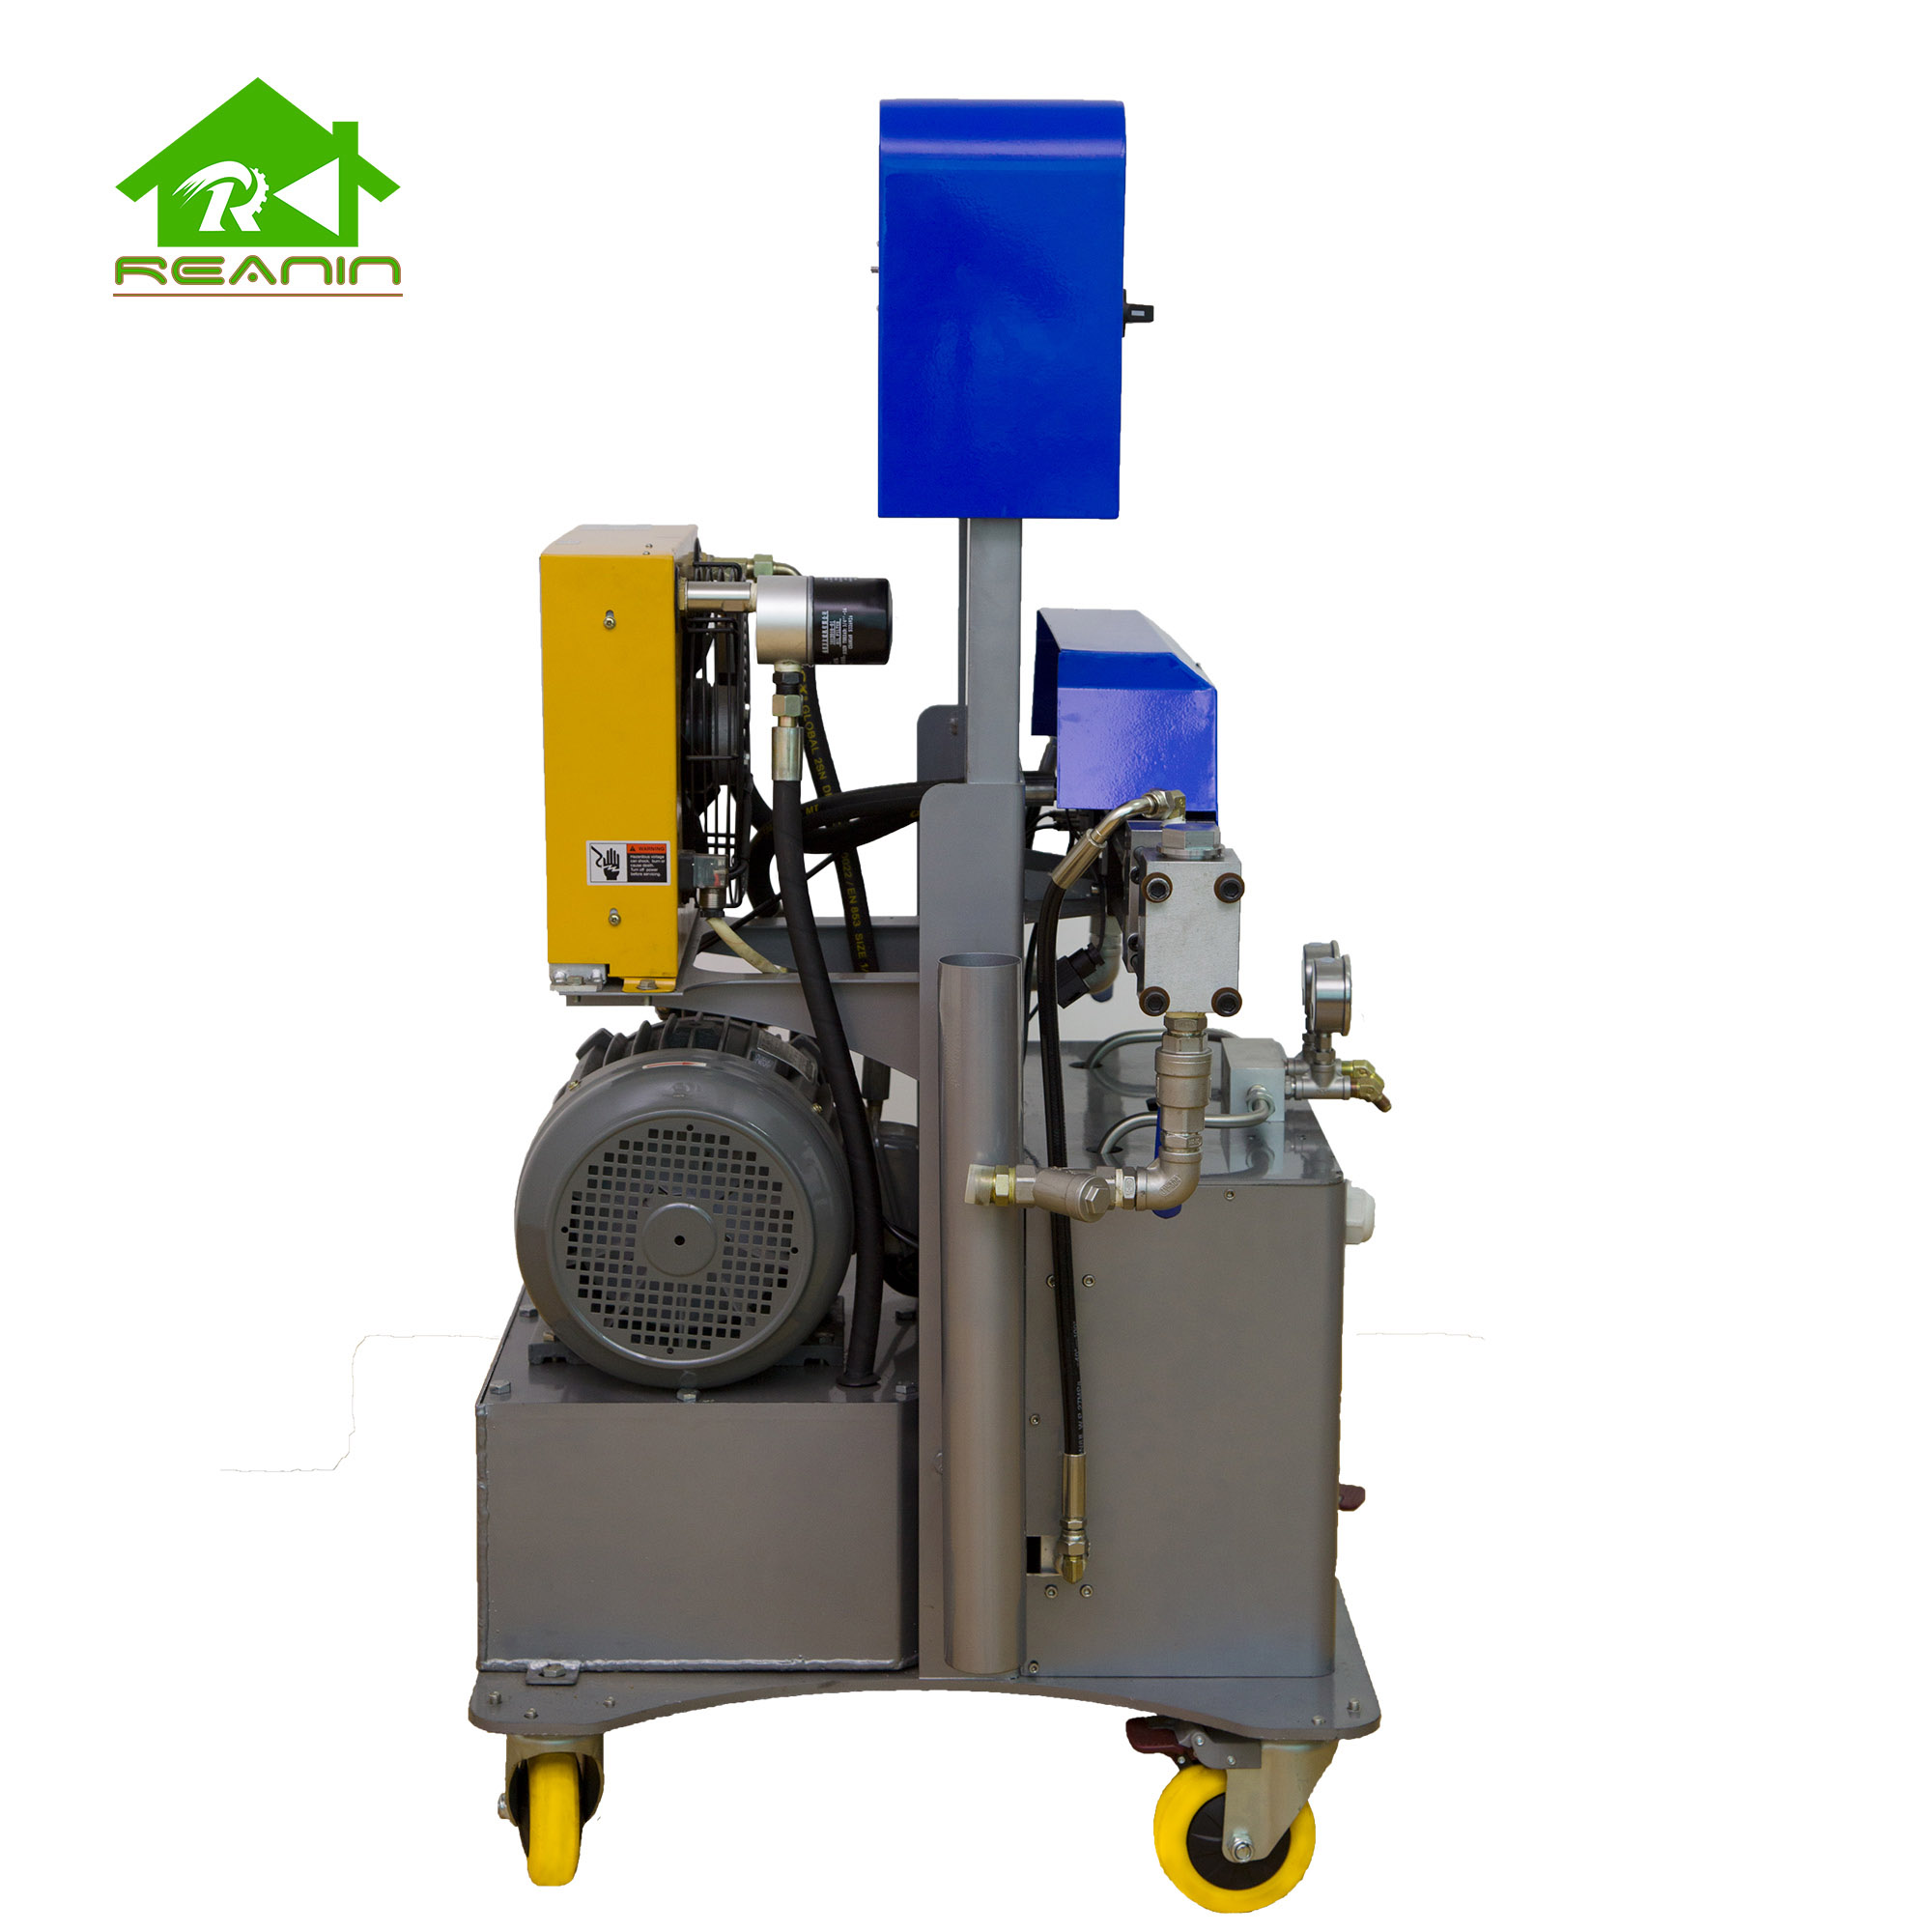 Polyurethane Foam Injection Machine - Buy polyurethane ...